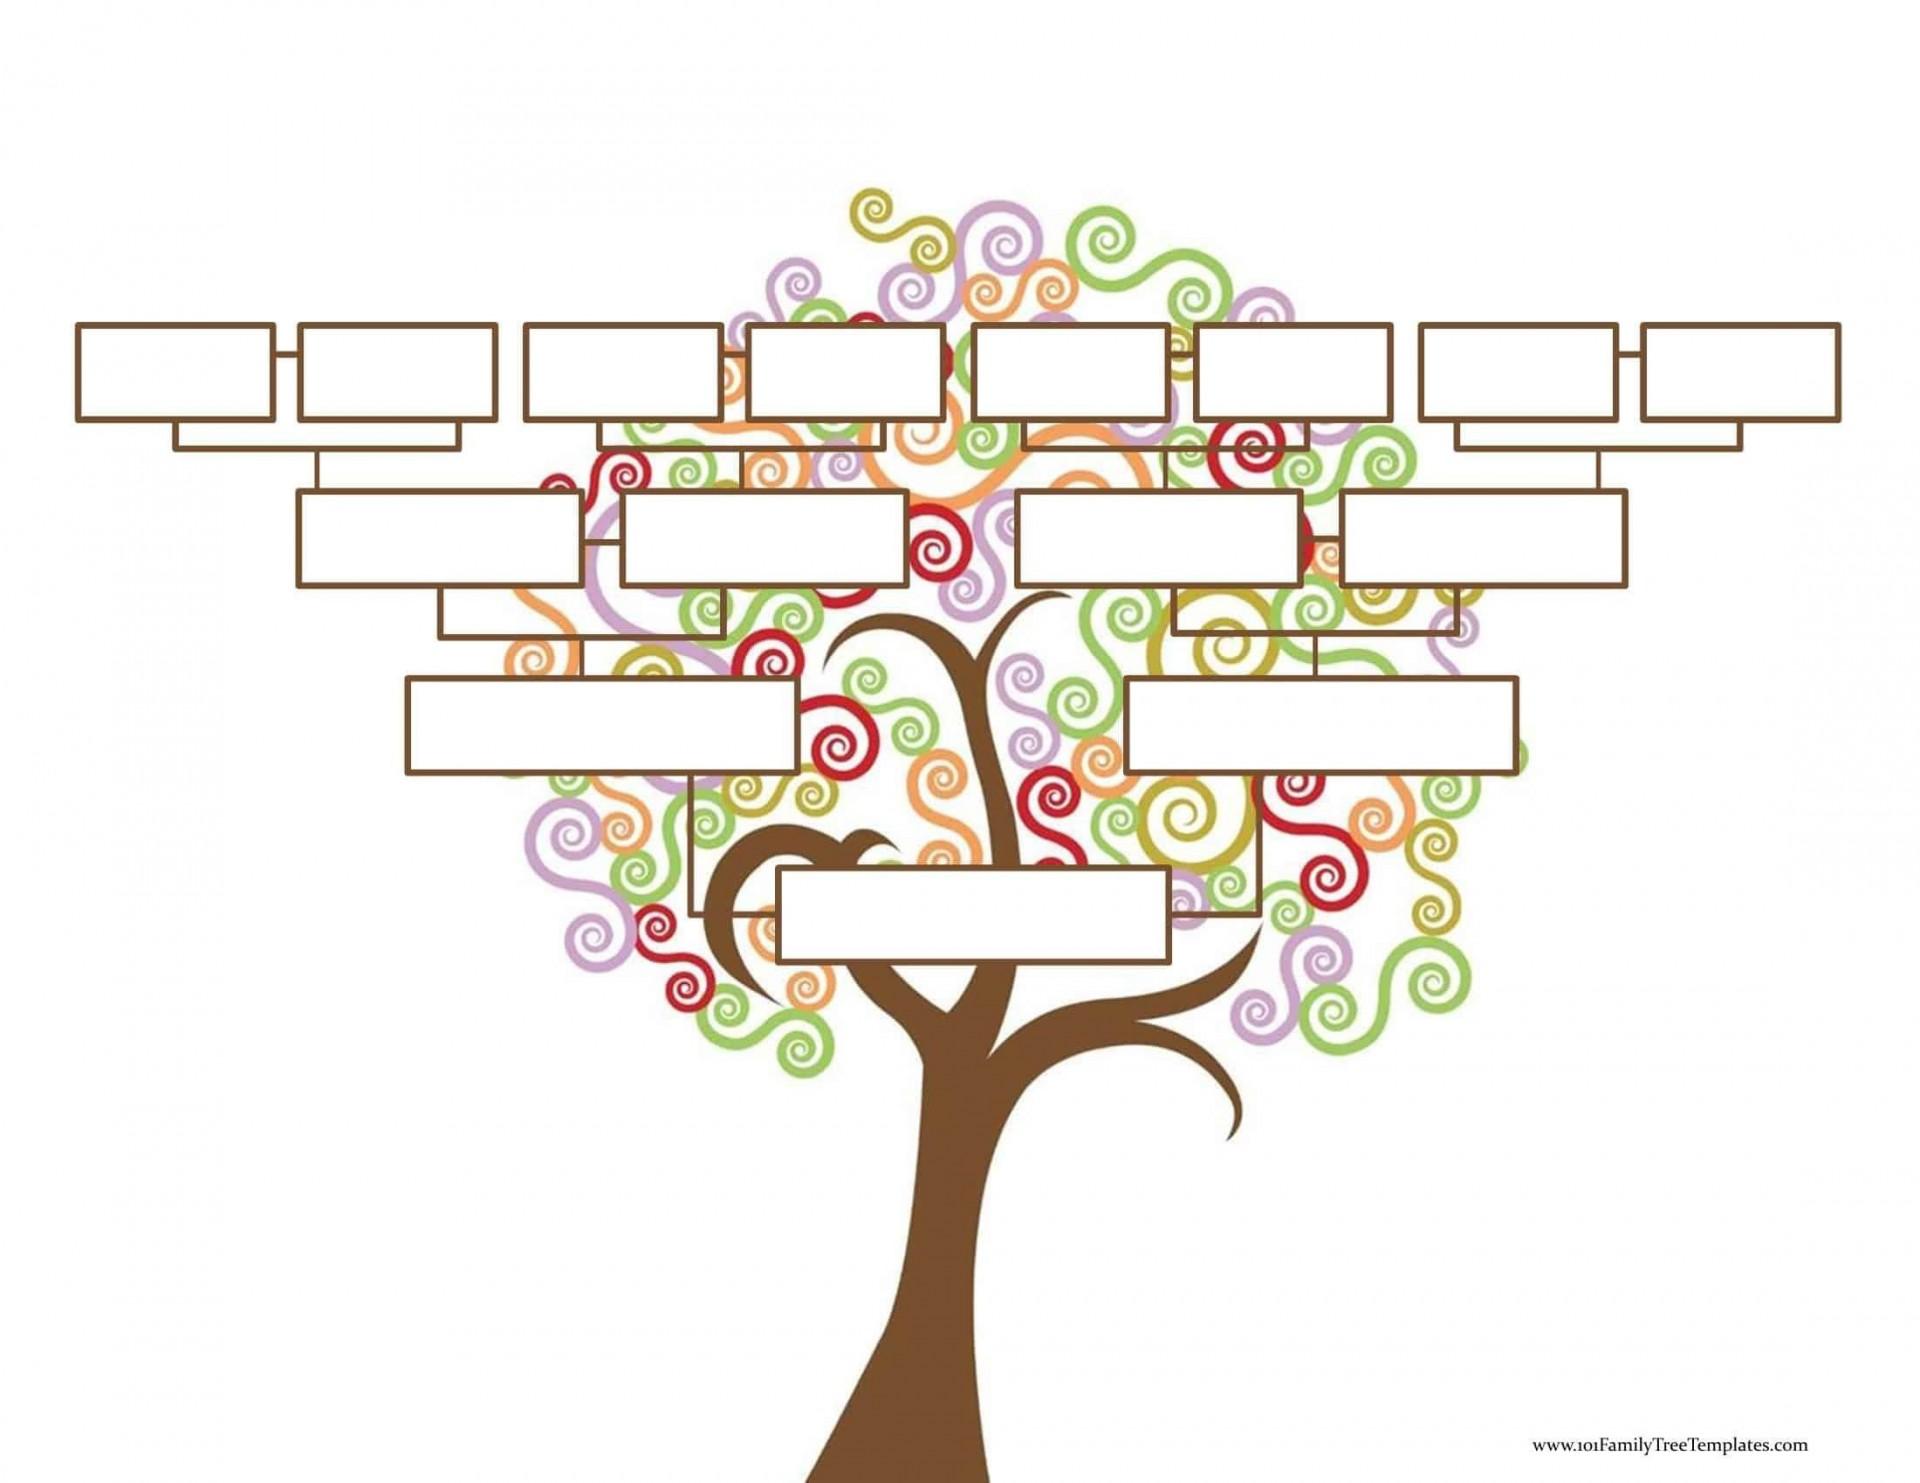 005 Sensational Free Editable Family Tree Template For Mac Example 1920